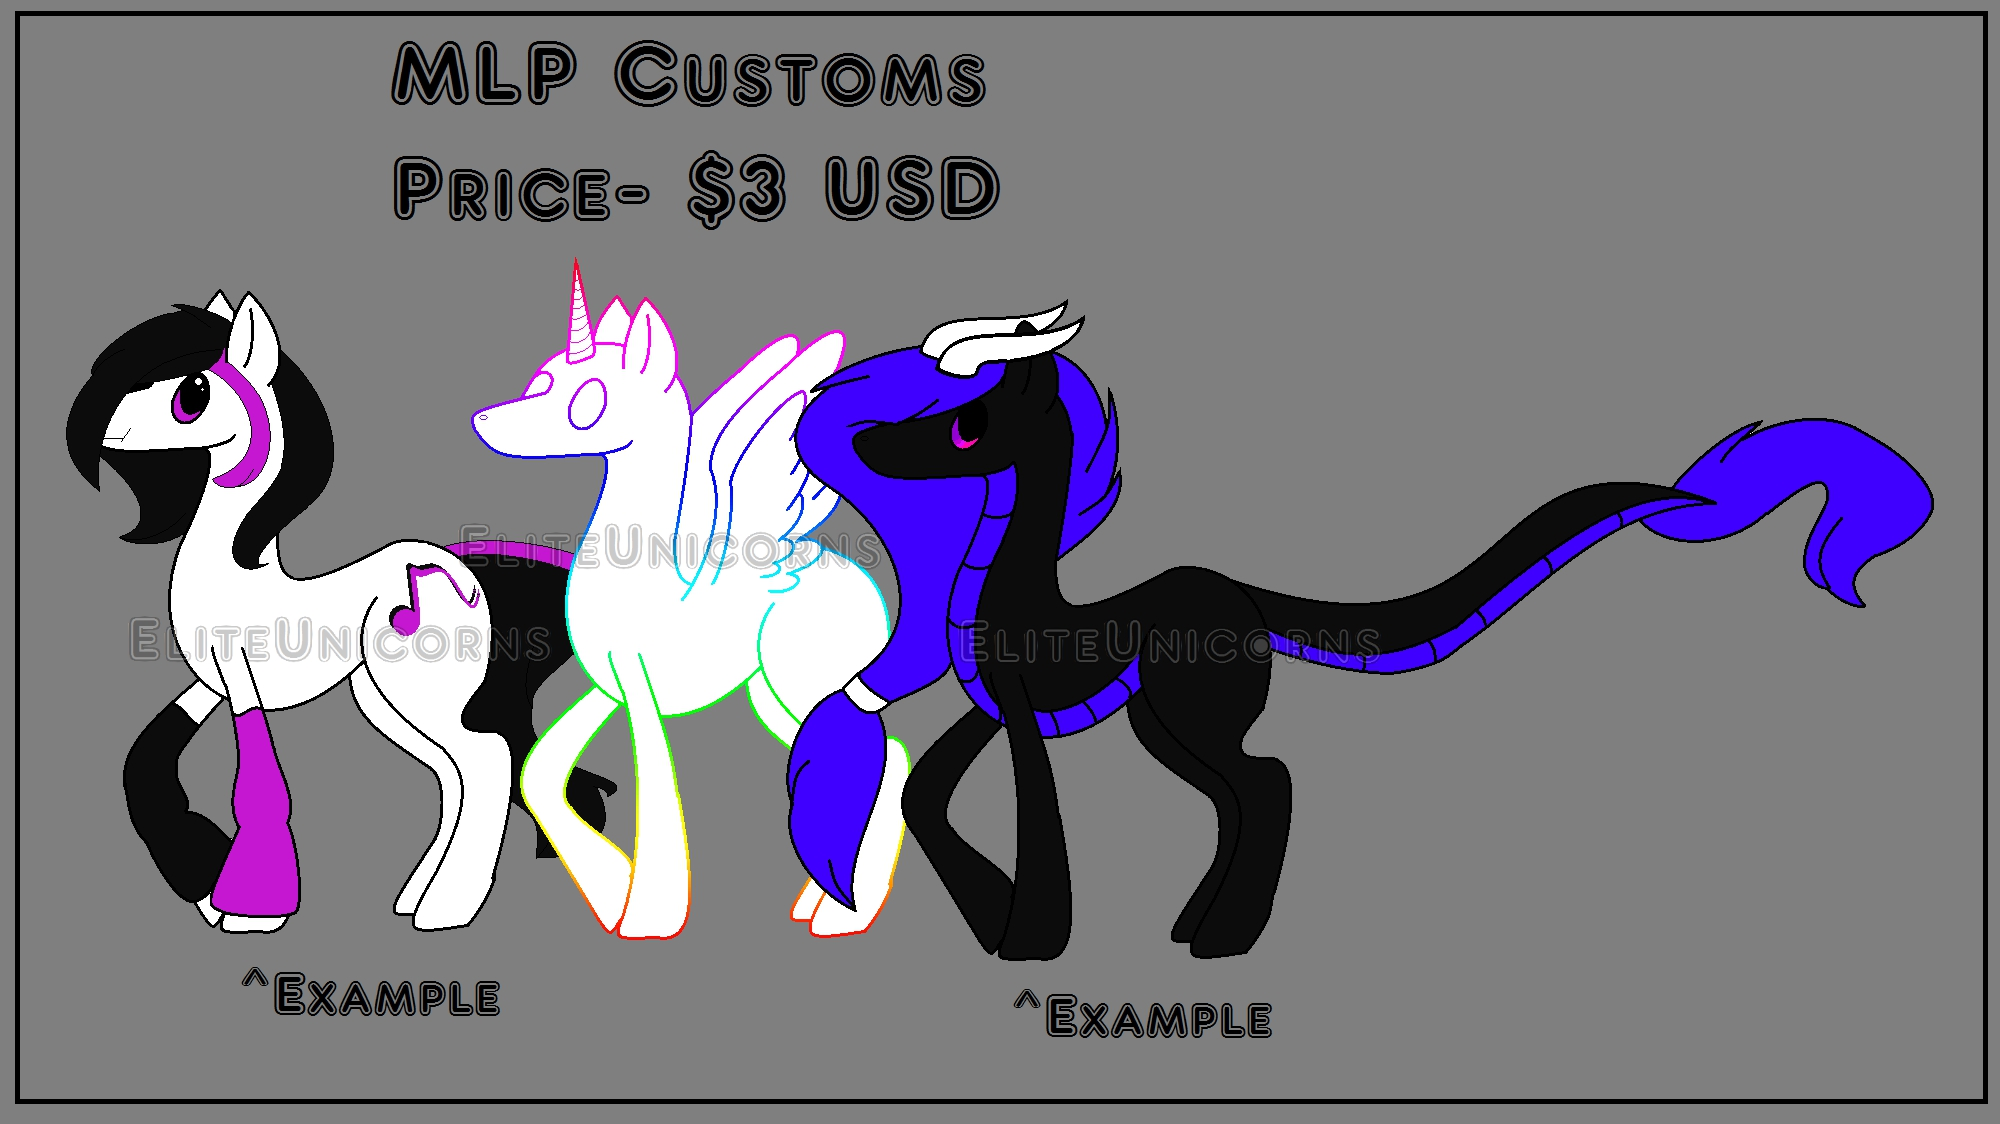 MLP Design Customs (OPEN) by EliteUnicorns